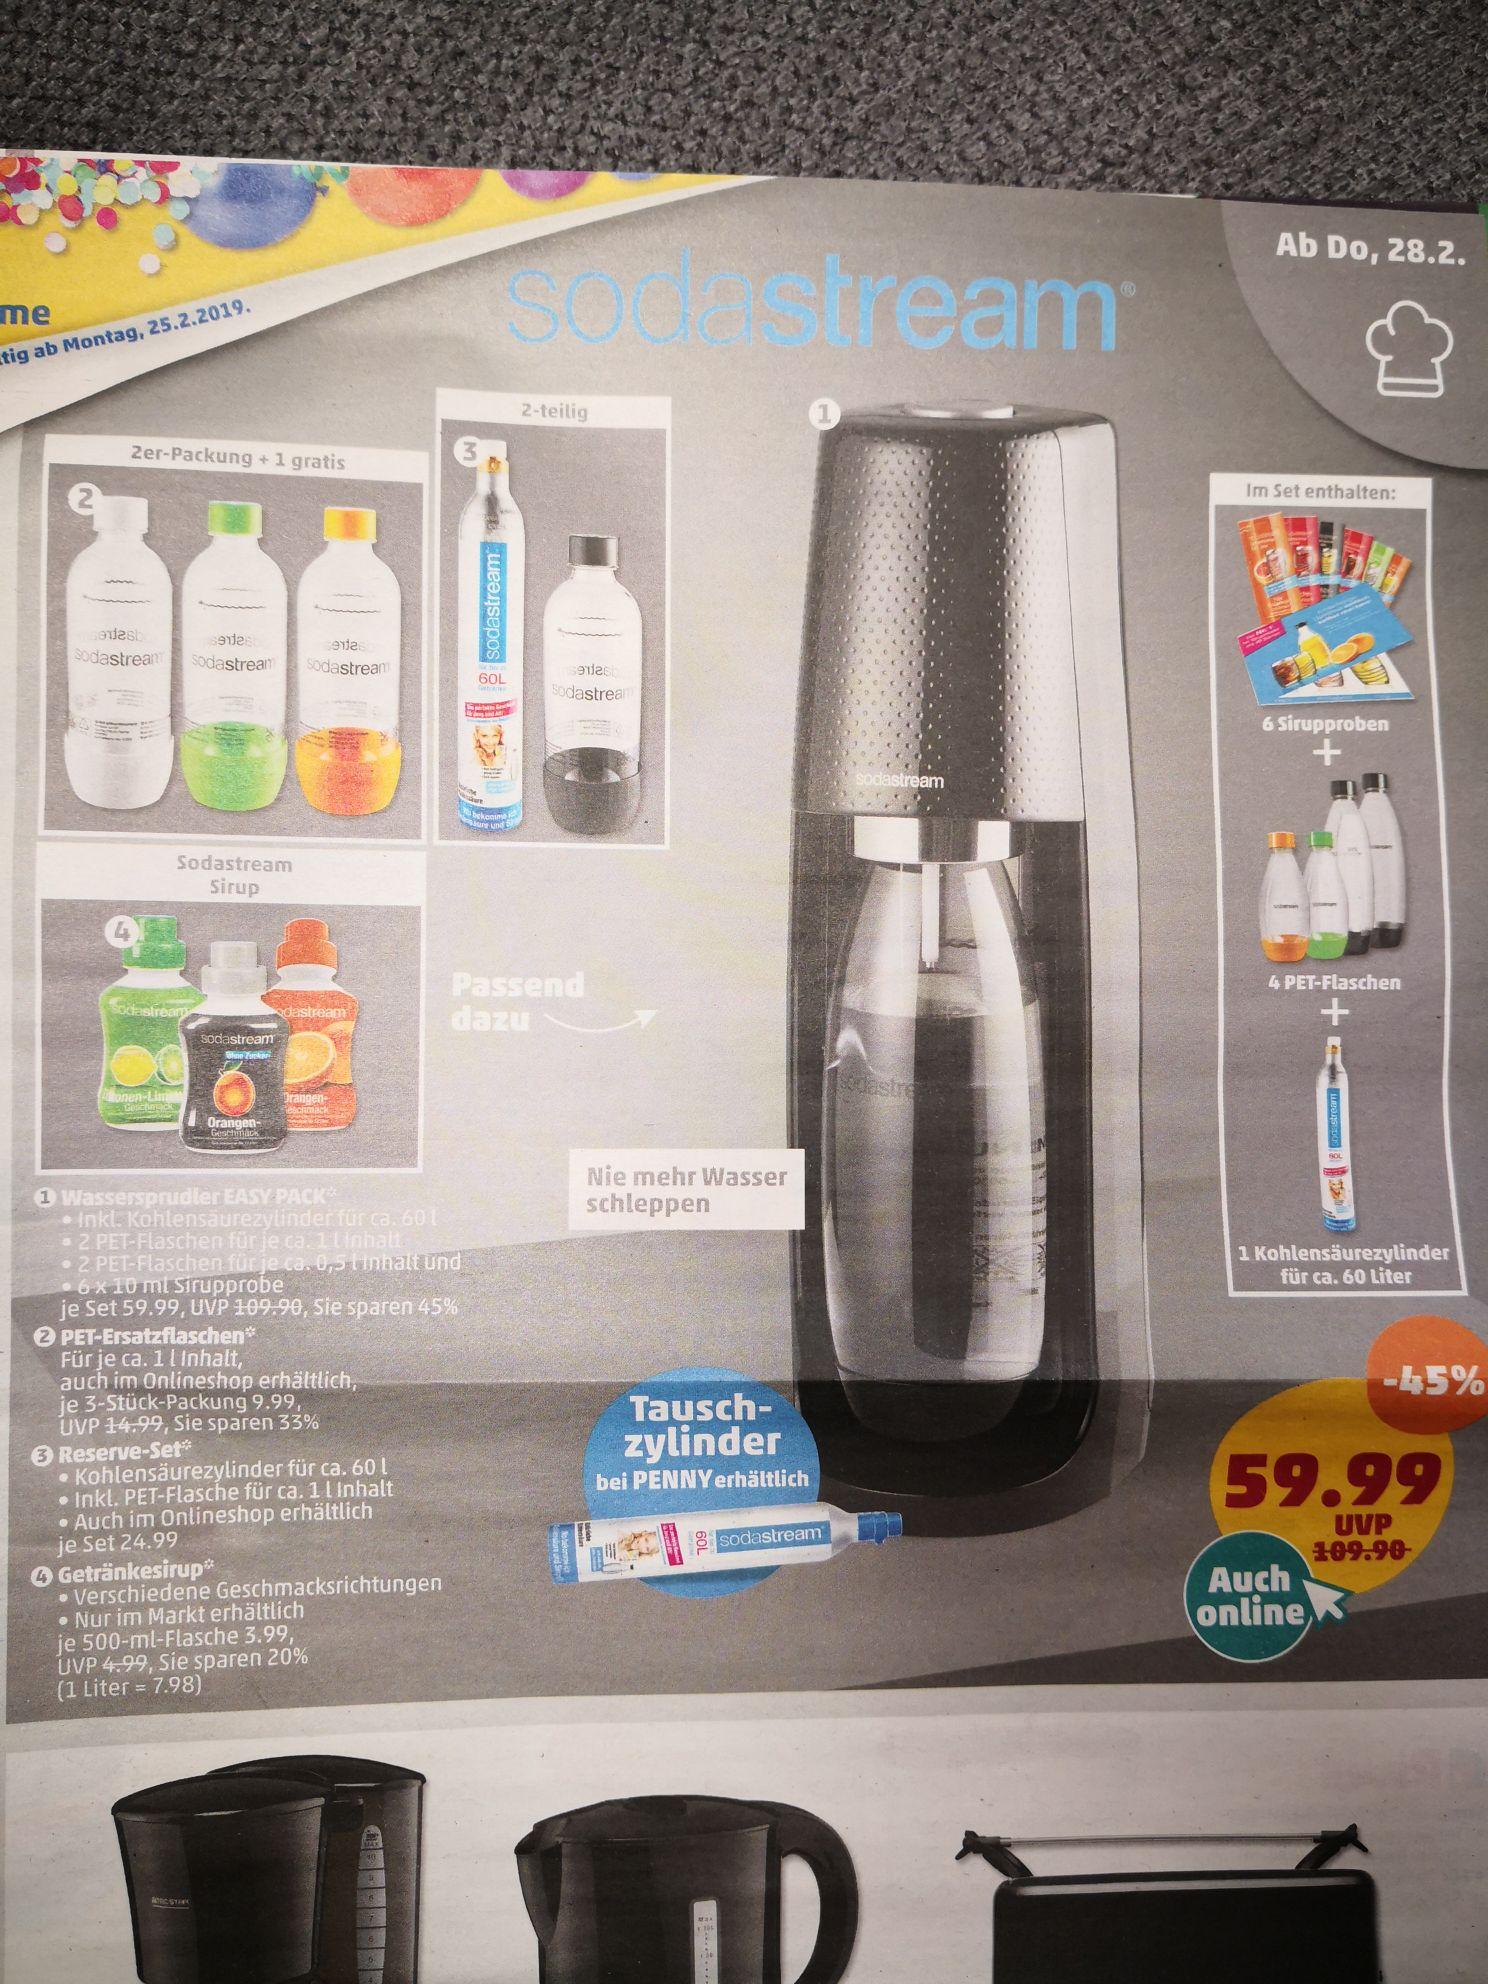 Sodastream Easy Pack - Penny (online & offline)